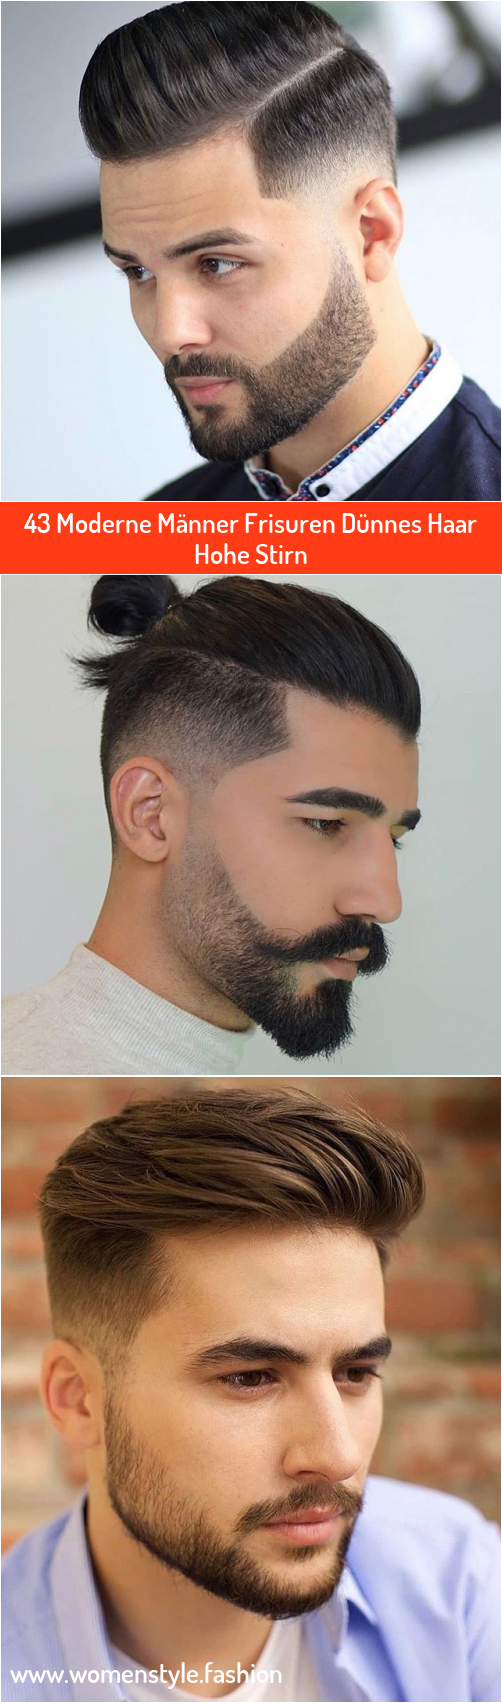 12 Moderne Männer Frisuren Dünnes Haar Hohe Stirn in 12